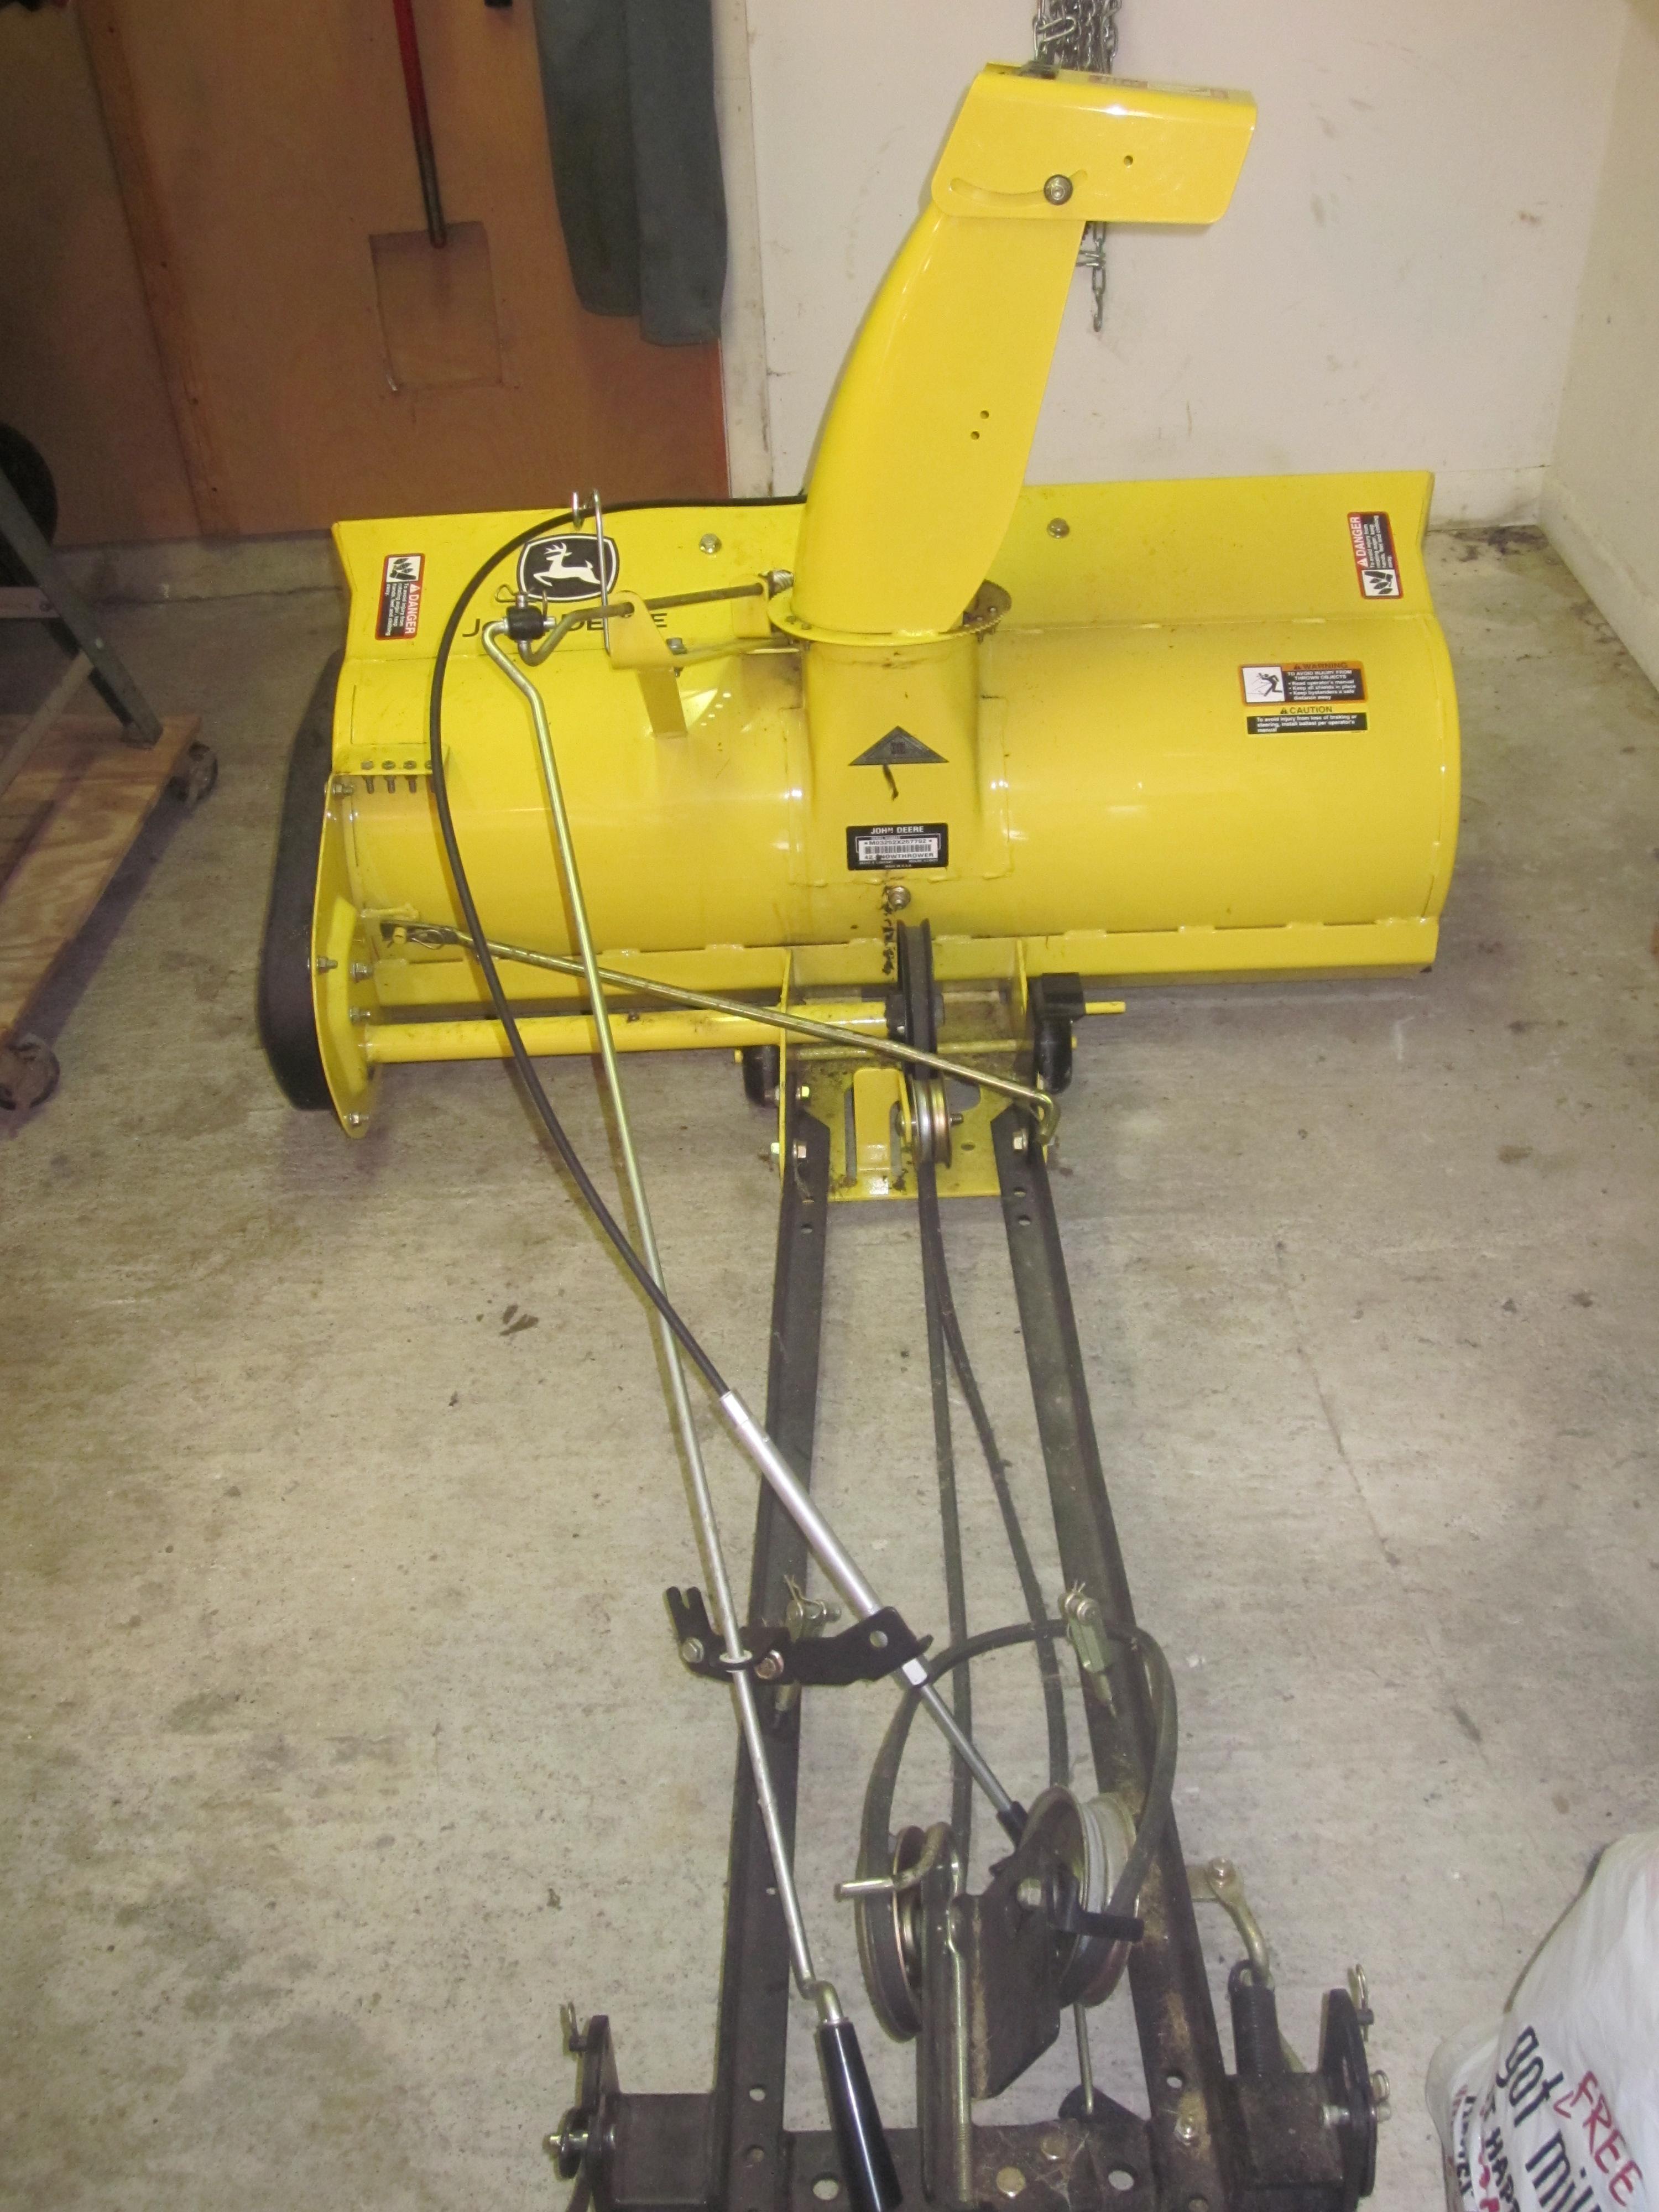 John Deere 345 Snowblower Parts Diagram Electrical Wiring Diagrams 826 42 Inch U2022 111